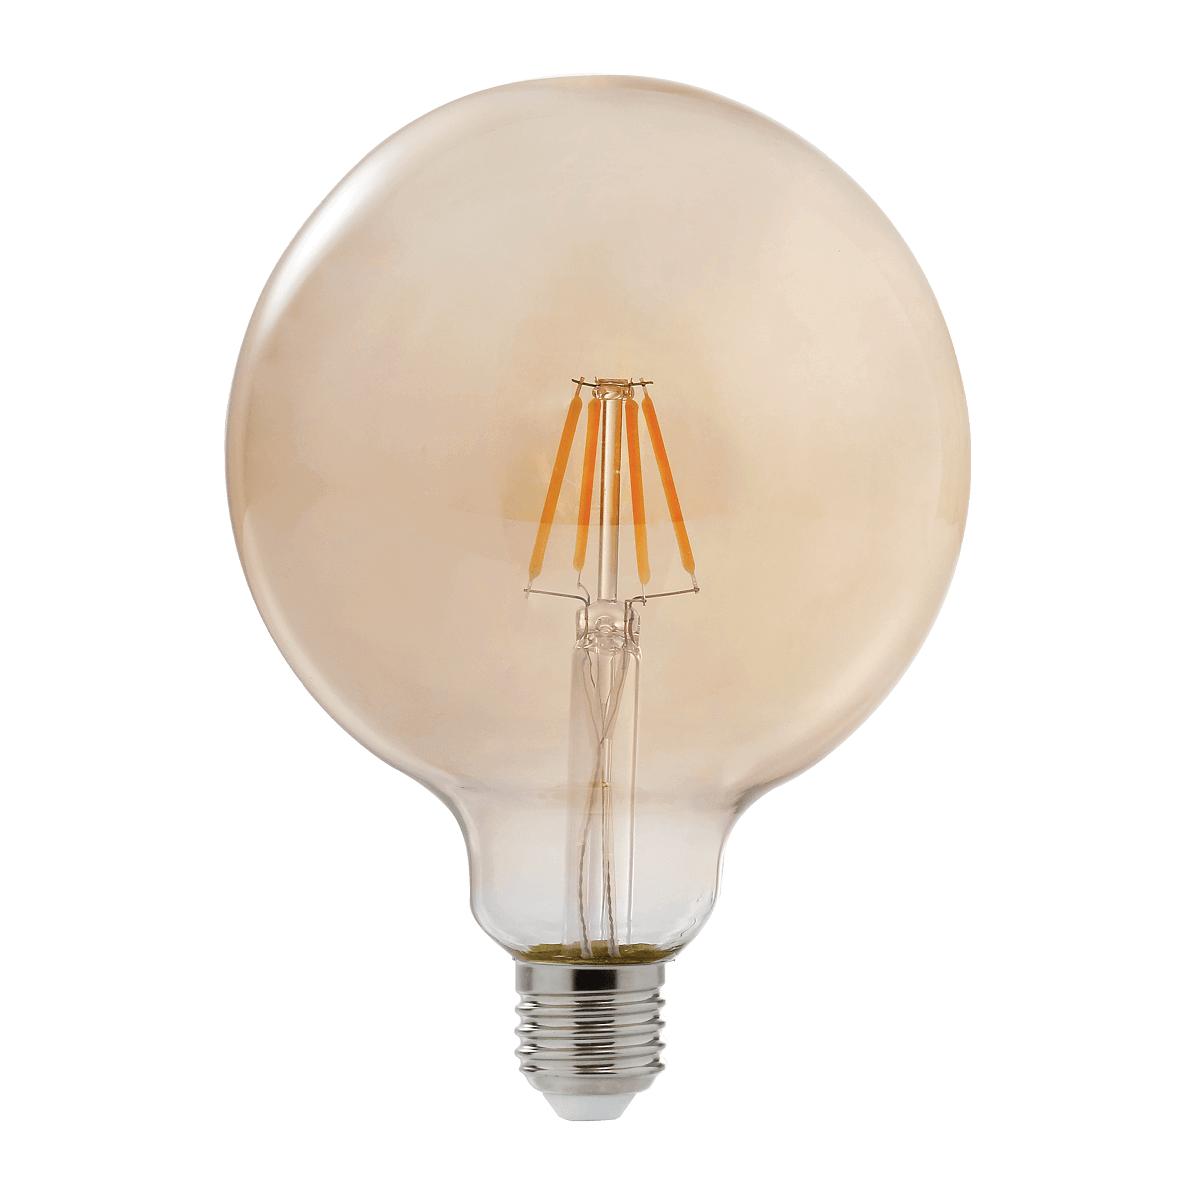 LAMPADA RETRO G125 FILAMENTO LED 4W 2200K BIVOLT AVANT